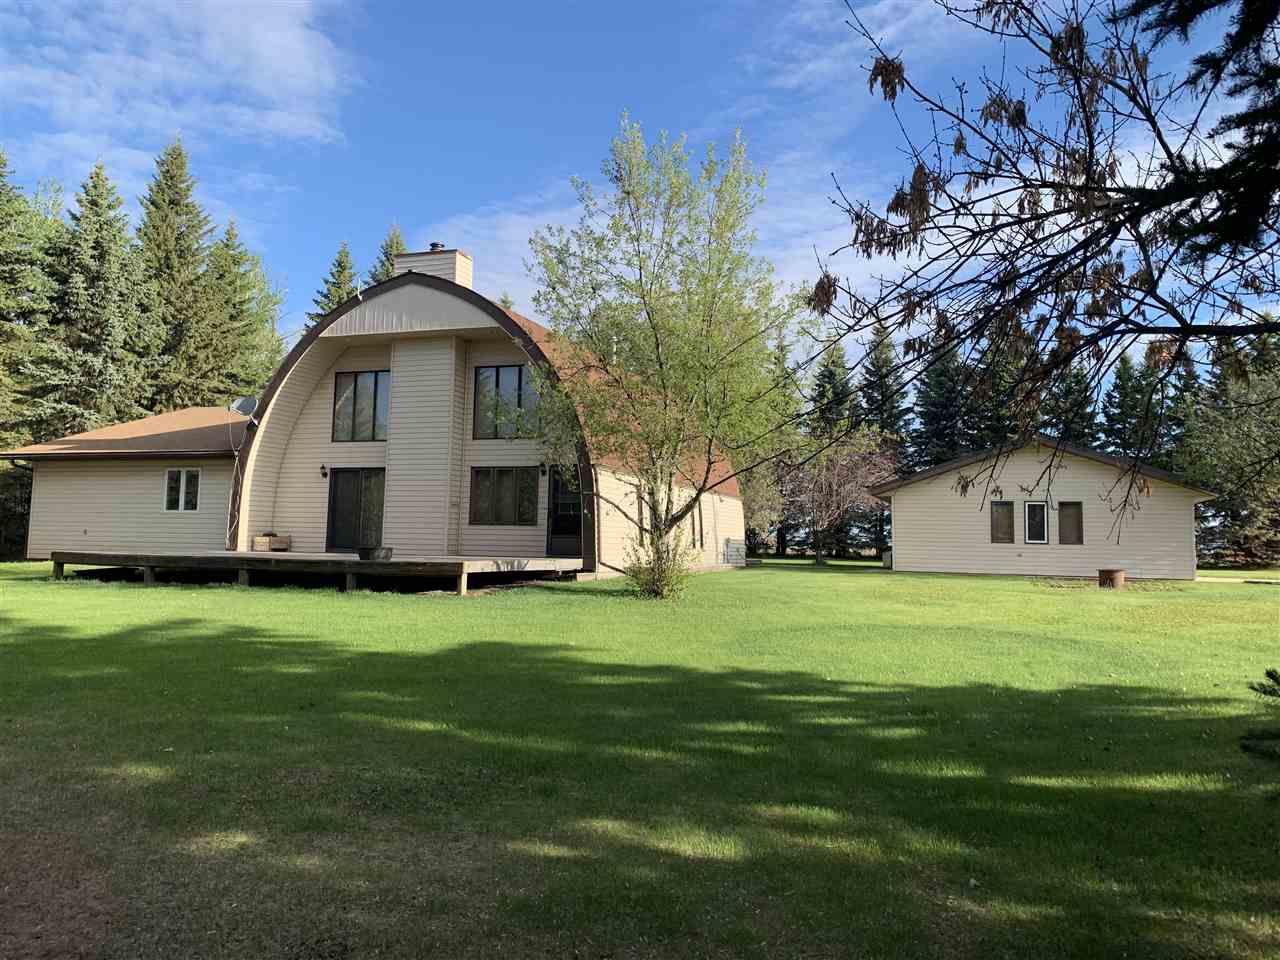 Main Photo: 2115 TWP RD 602: Rural Barrhead County House for sale : MLS®# E4145175